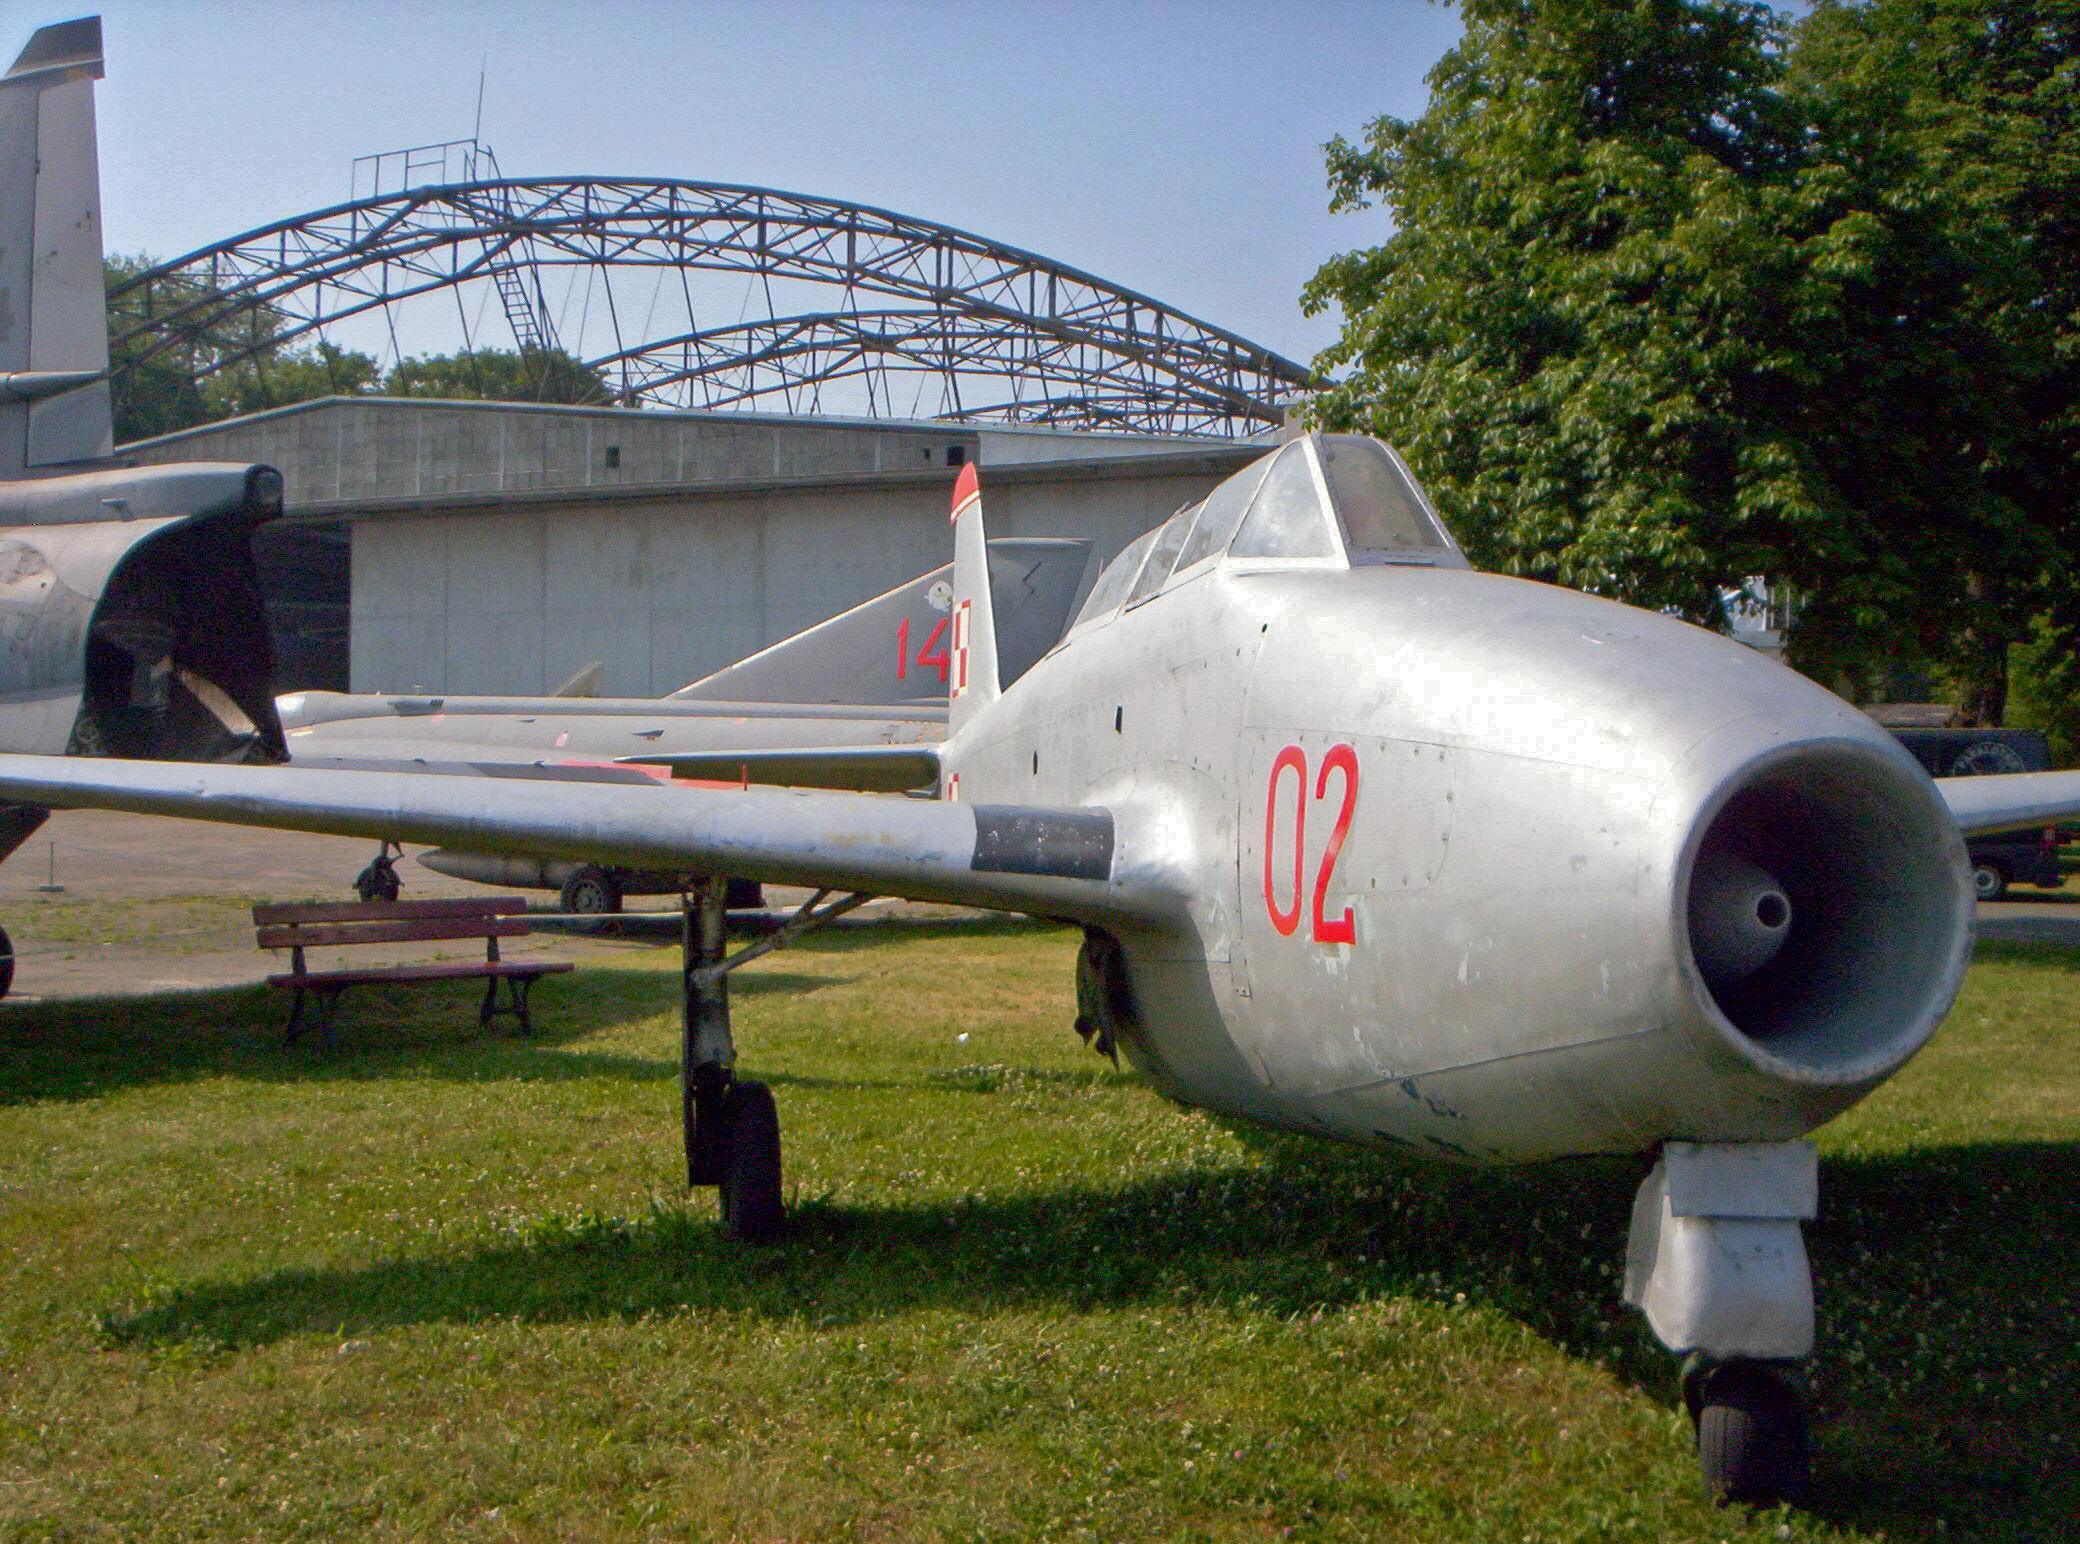 Jak-17UTI